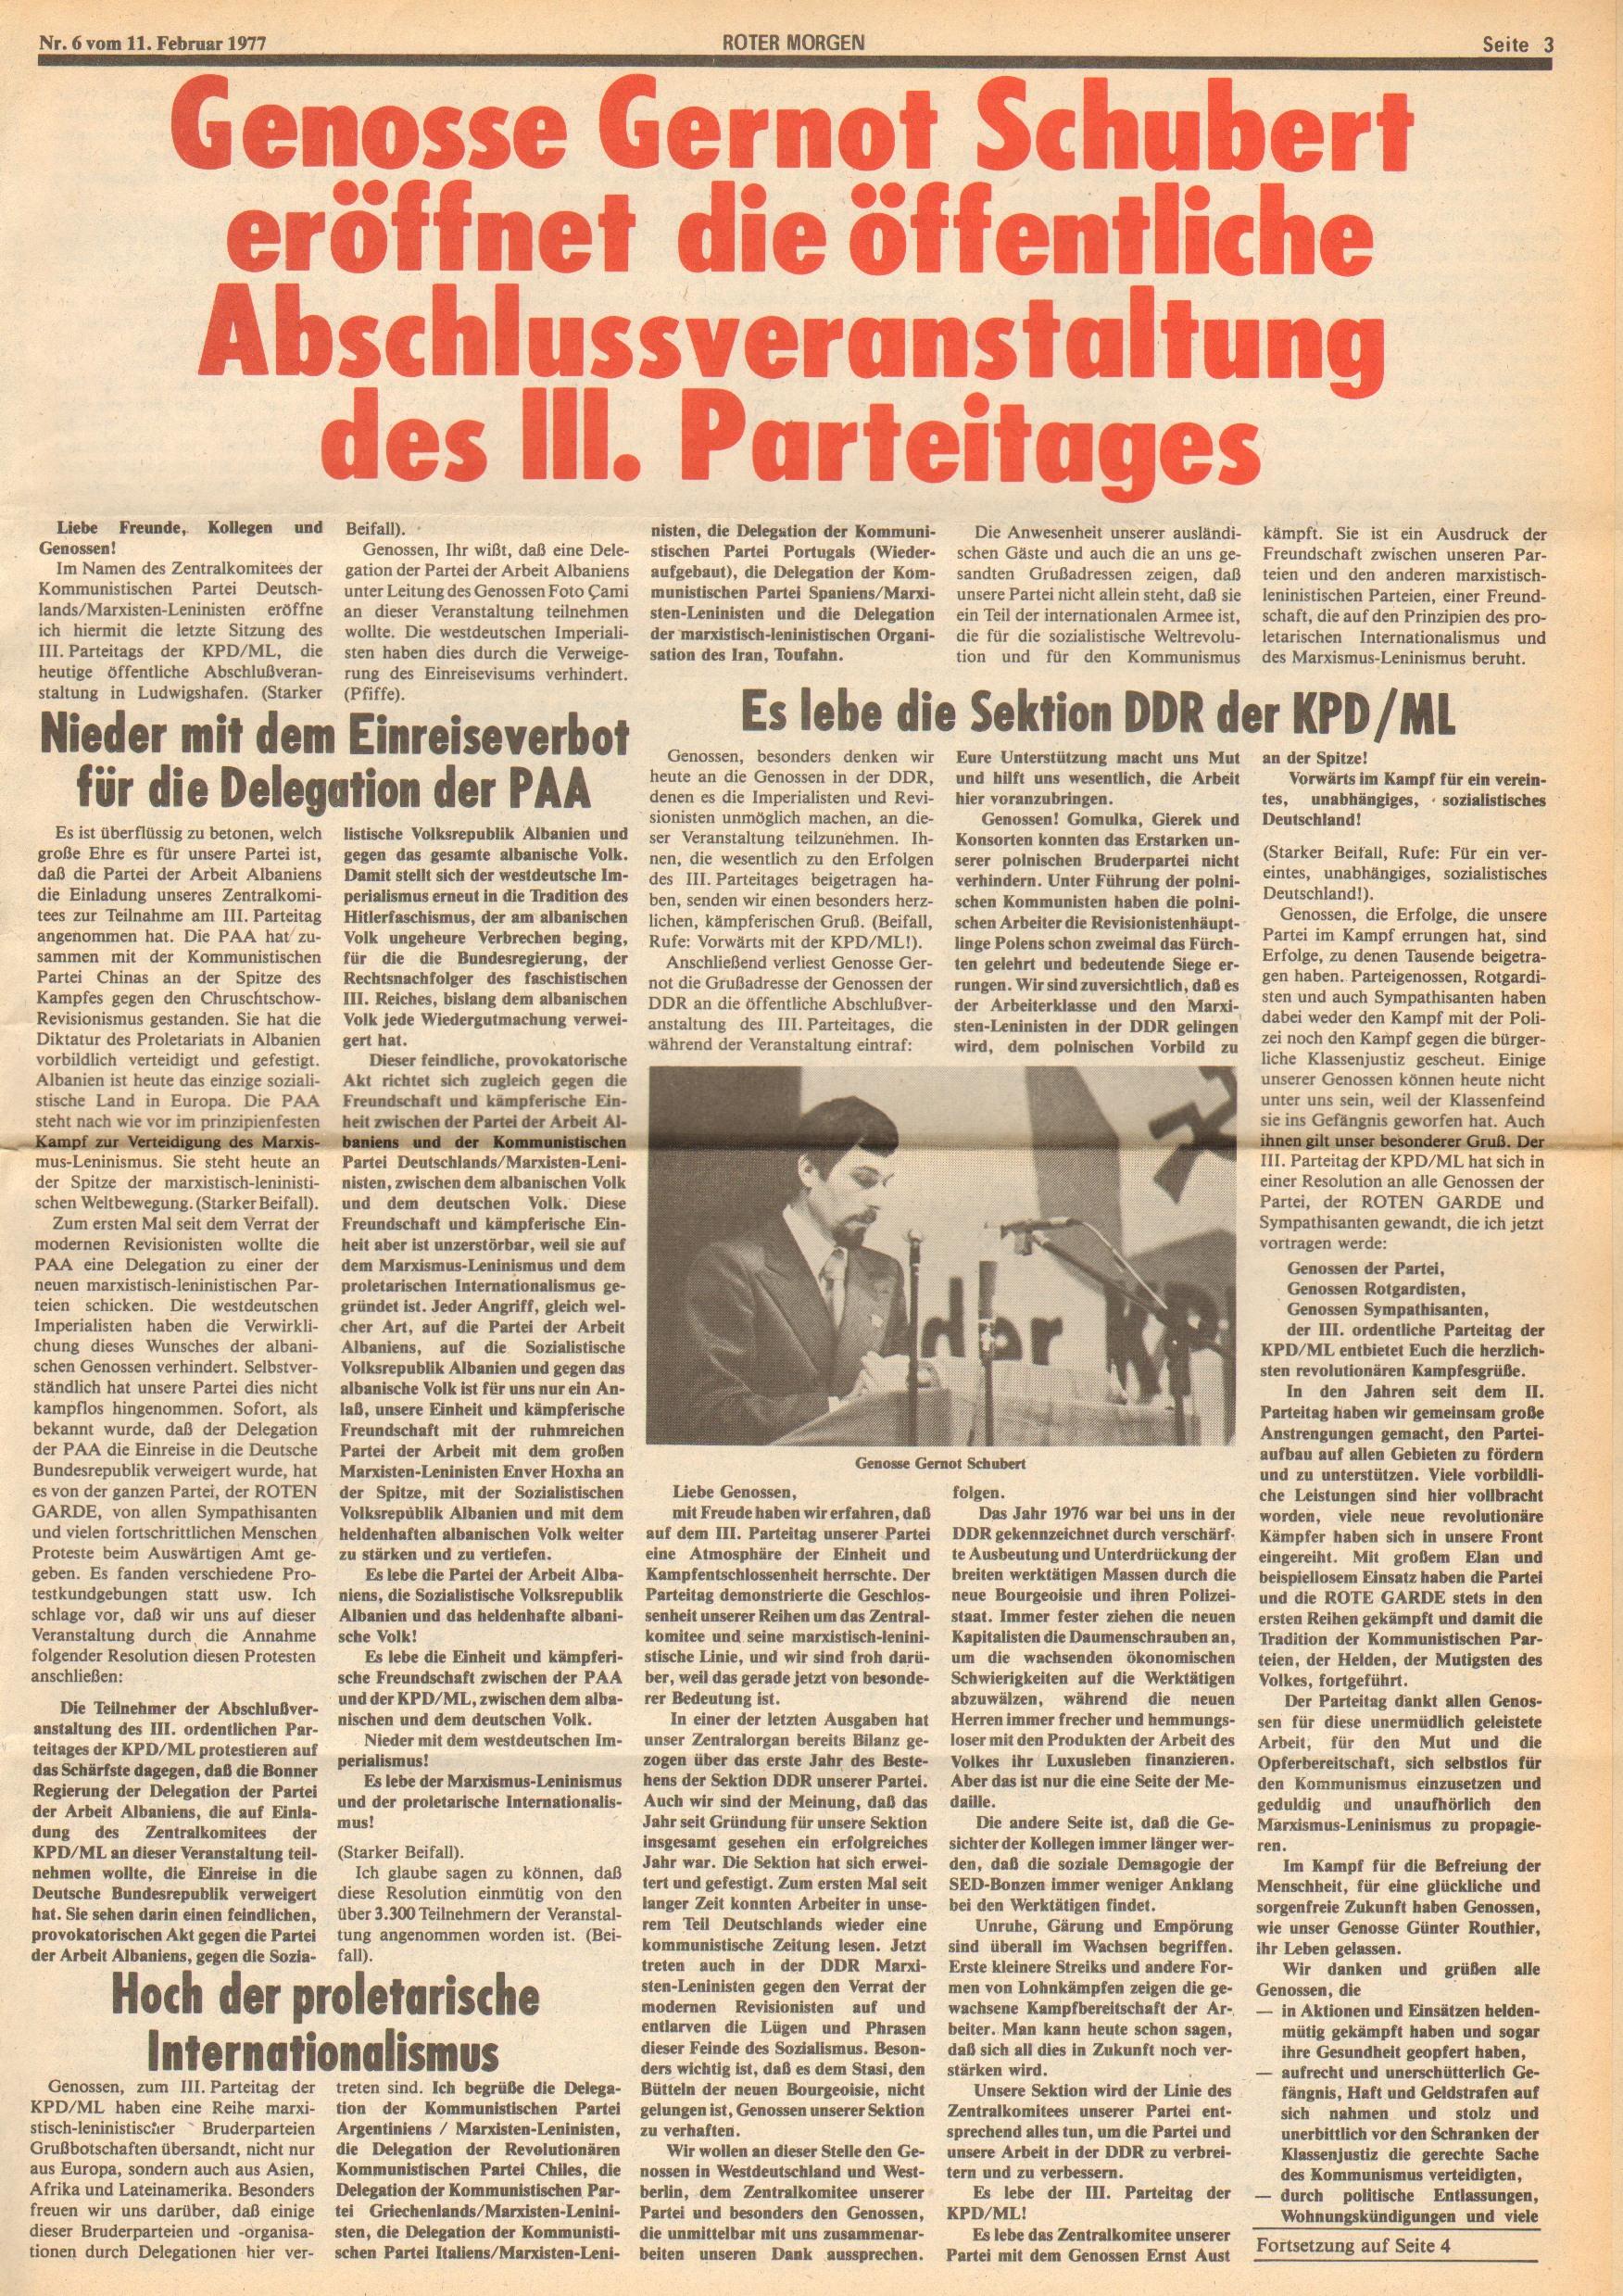 Roter Morgen, 11. Jg., 11. Februar 1977, Nr. 6, Seite 3